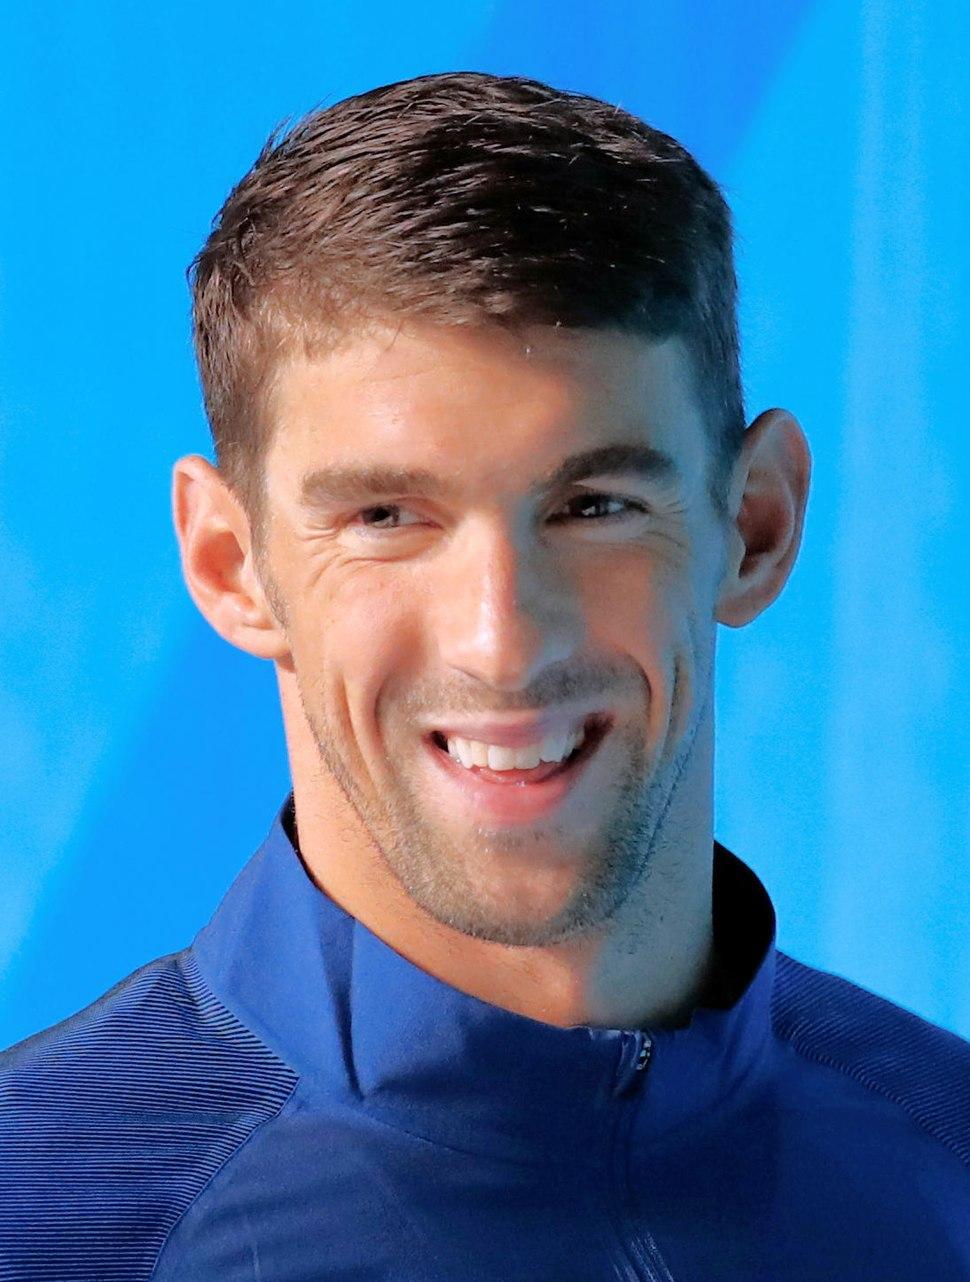 Michael Phelps Rio Olympics 2016